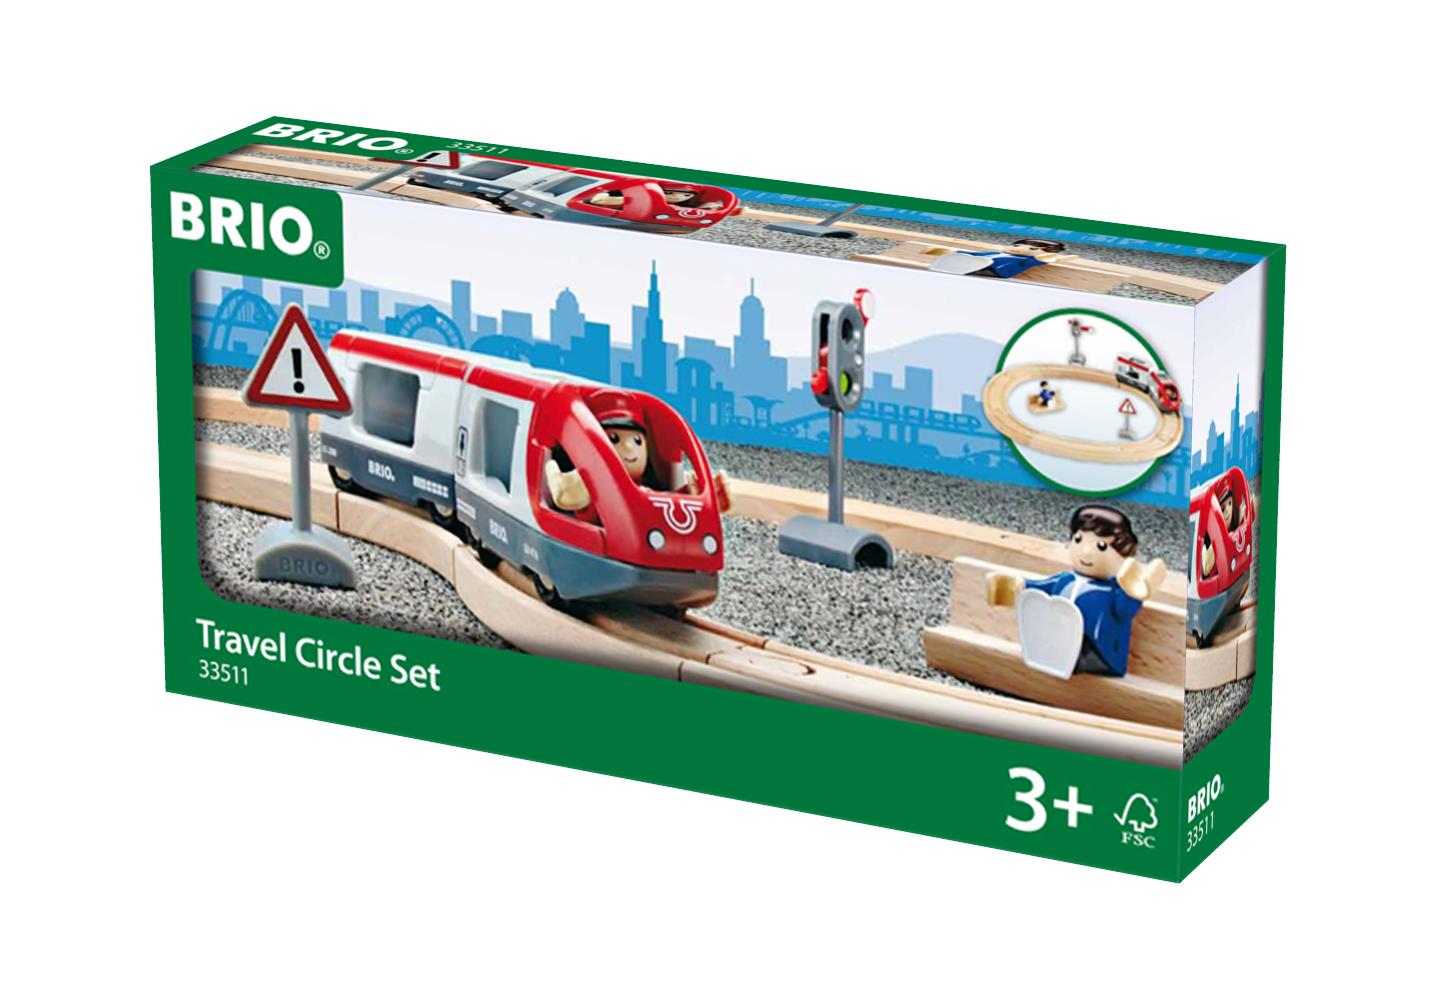 Circuit voyageur - Brio